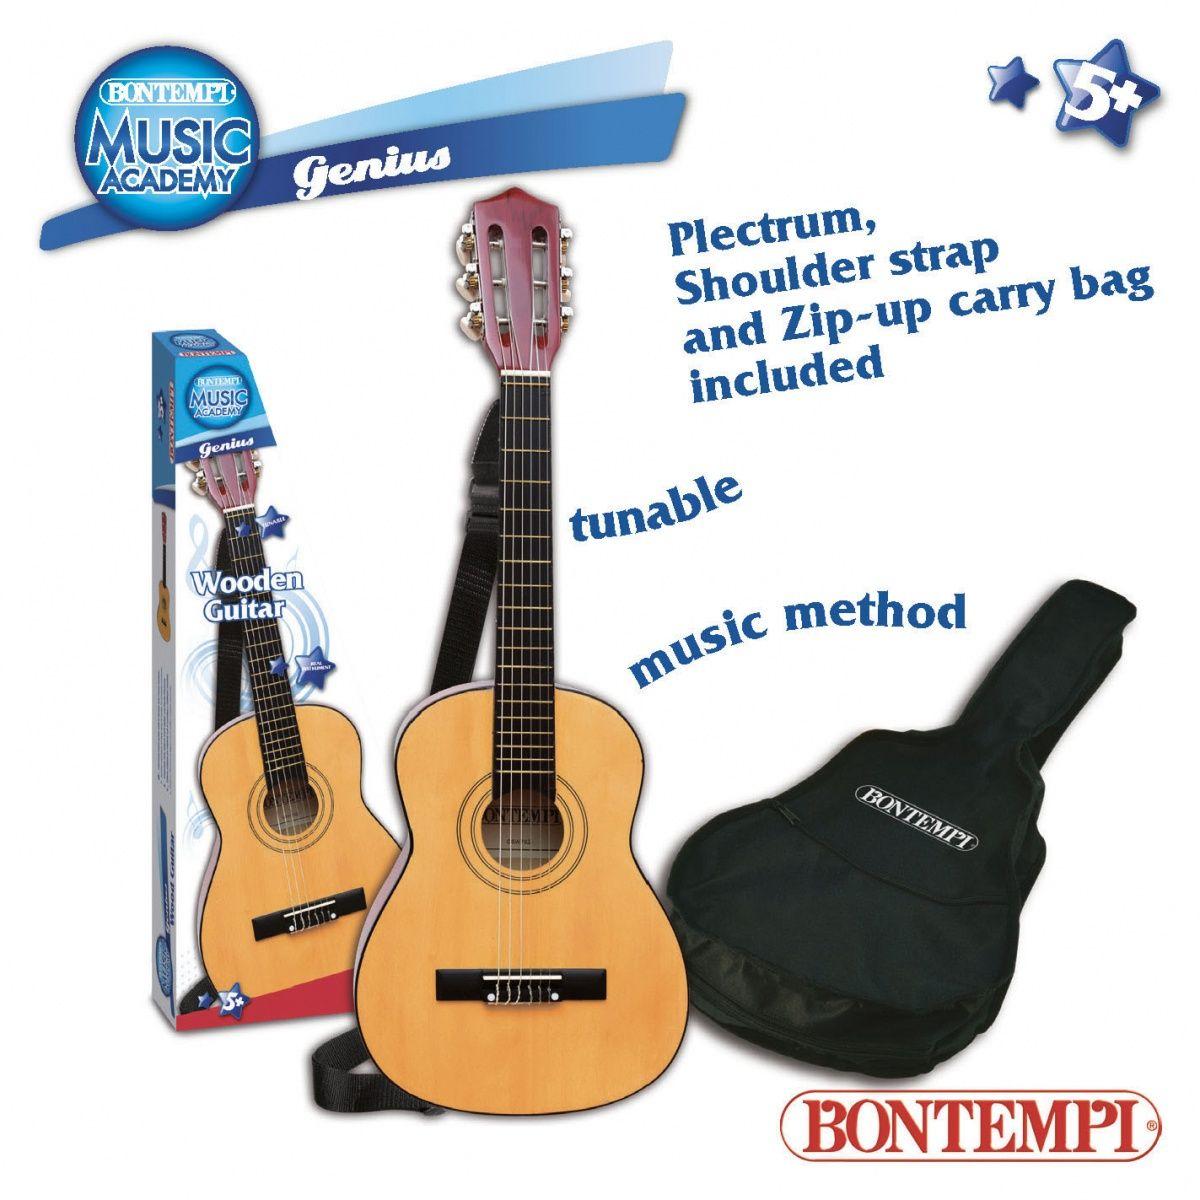 Dante Bontempi Play Wooden guitar (041-11468) 041-11468